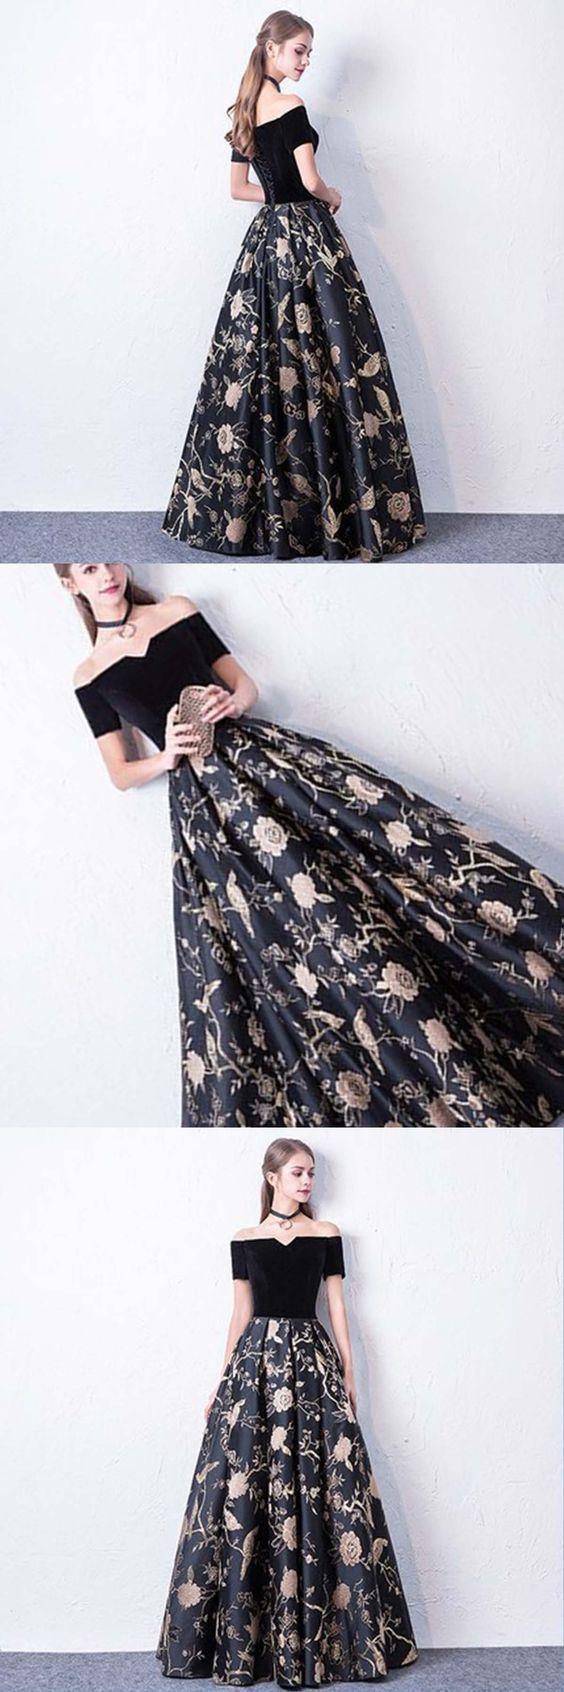 Black floral print satin long prom dress strapless evening dress